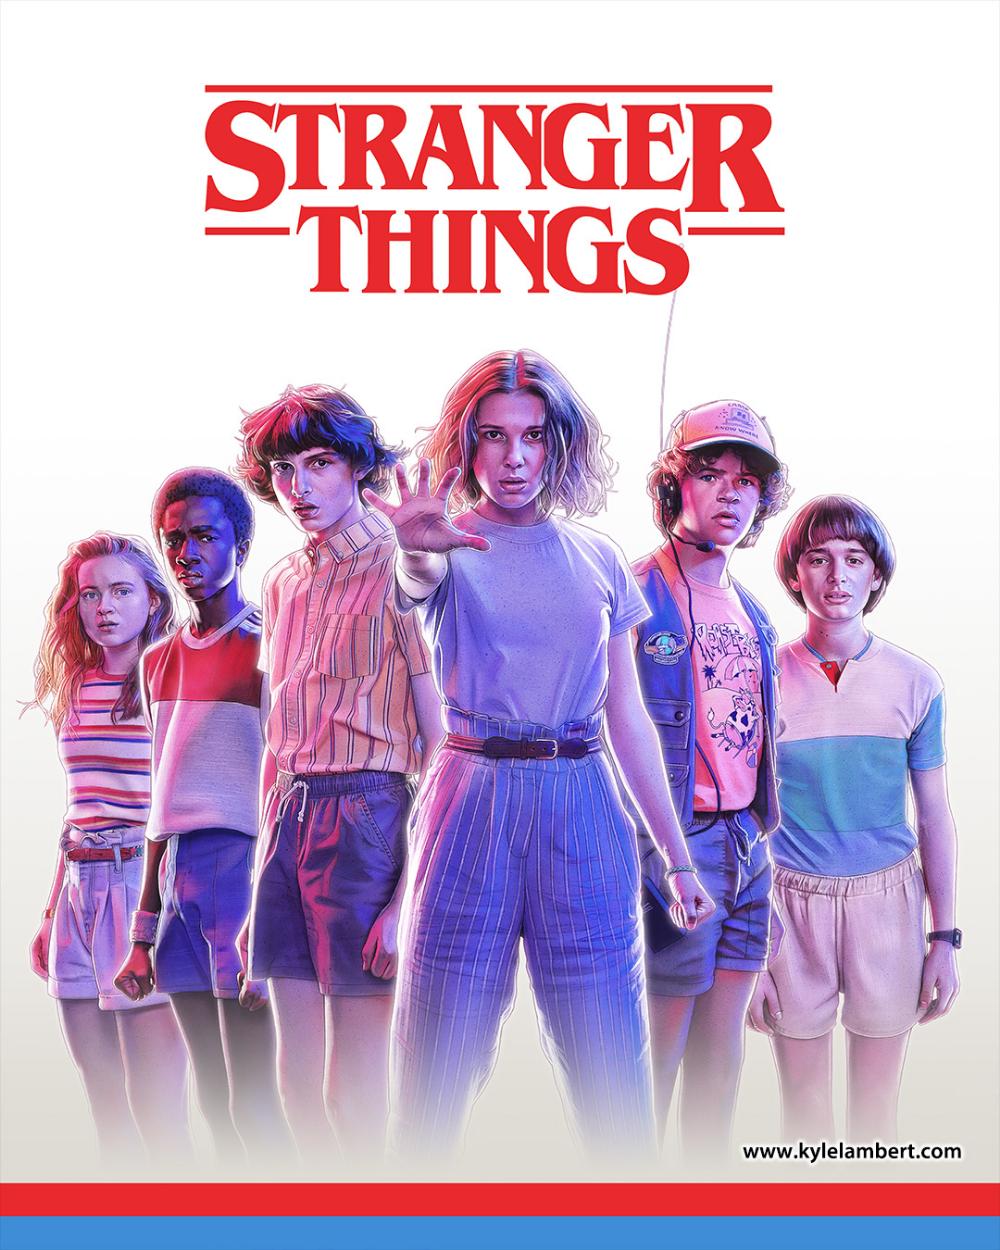 Stranger Things 3 - OFFICIAL Merch Art